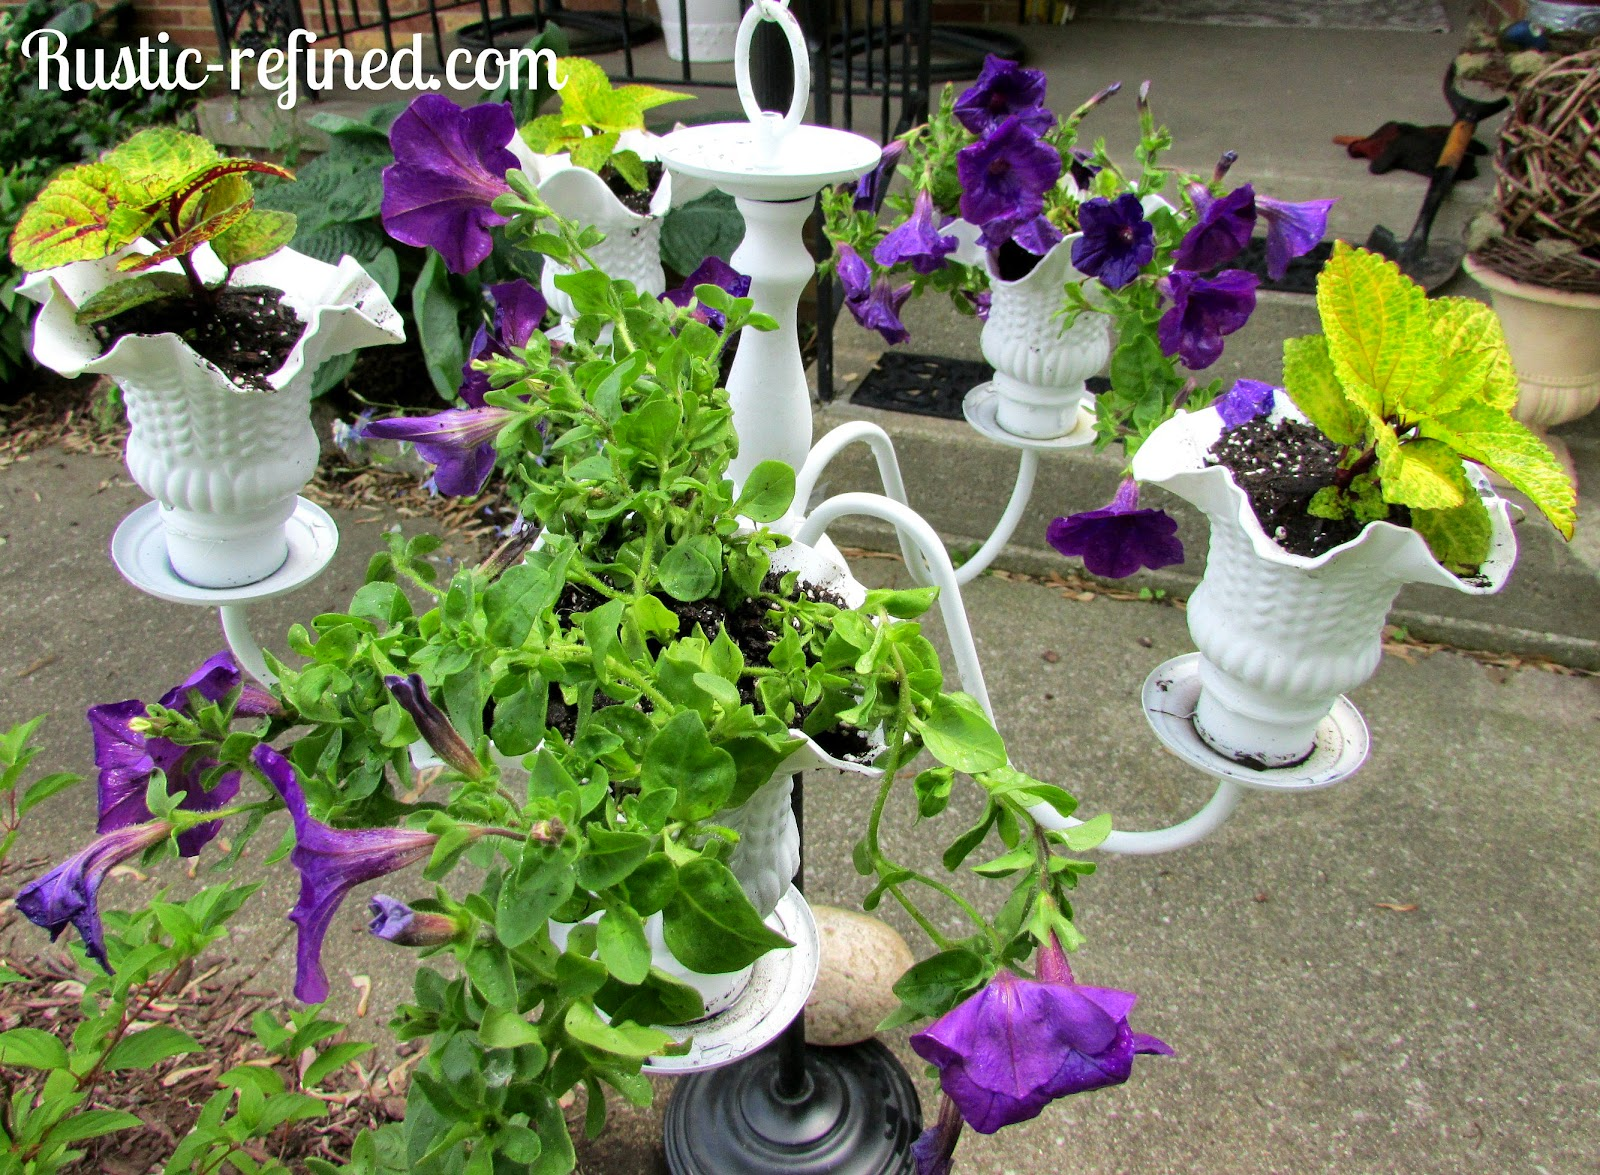 Garden Art - A Flower Chandelier @ Rustic-refined.com